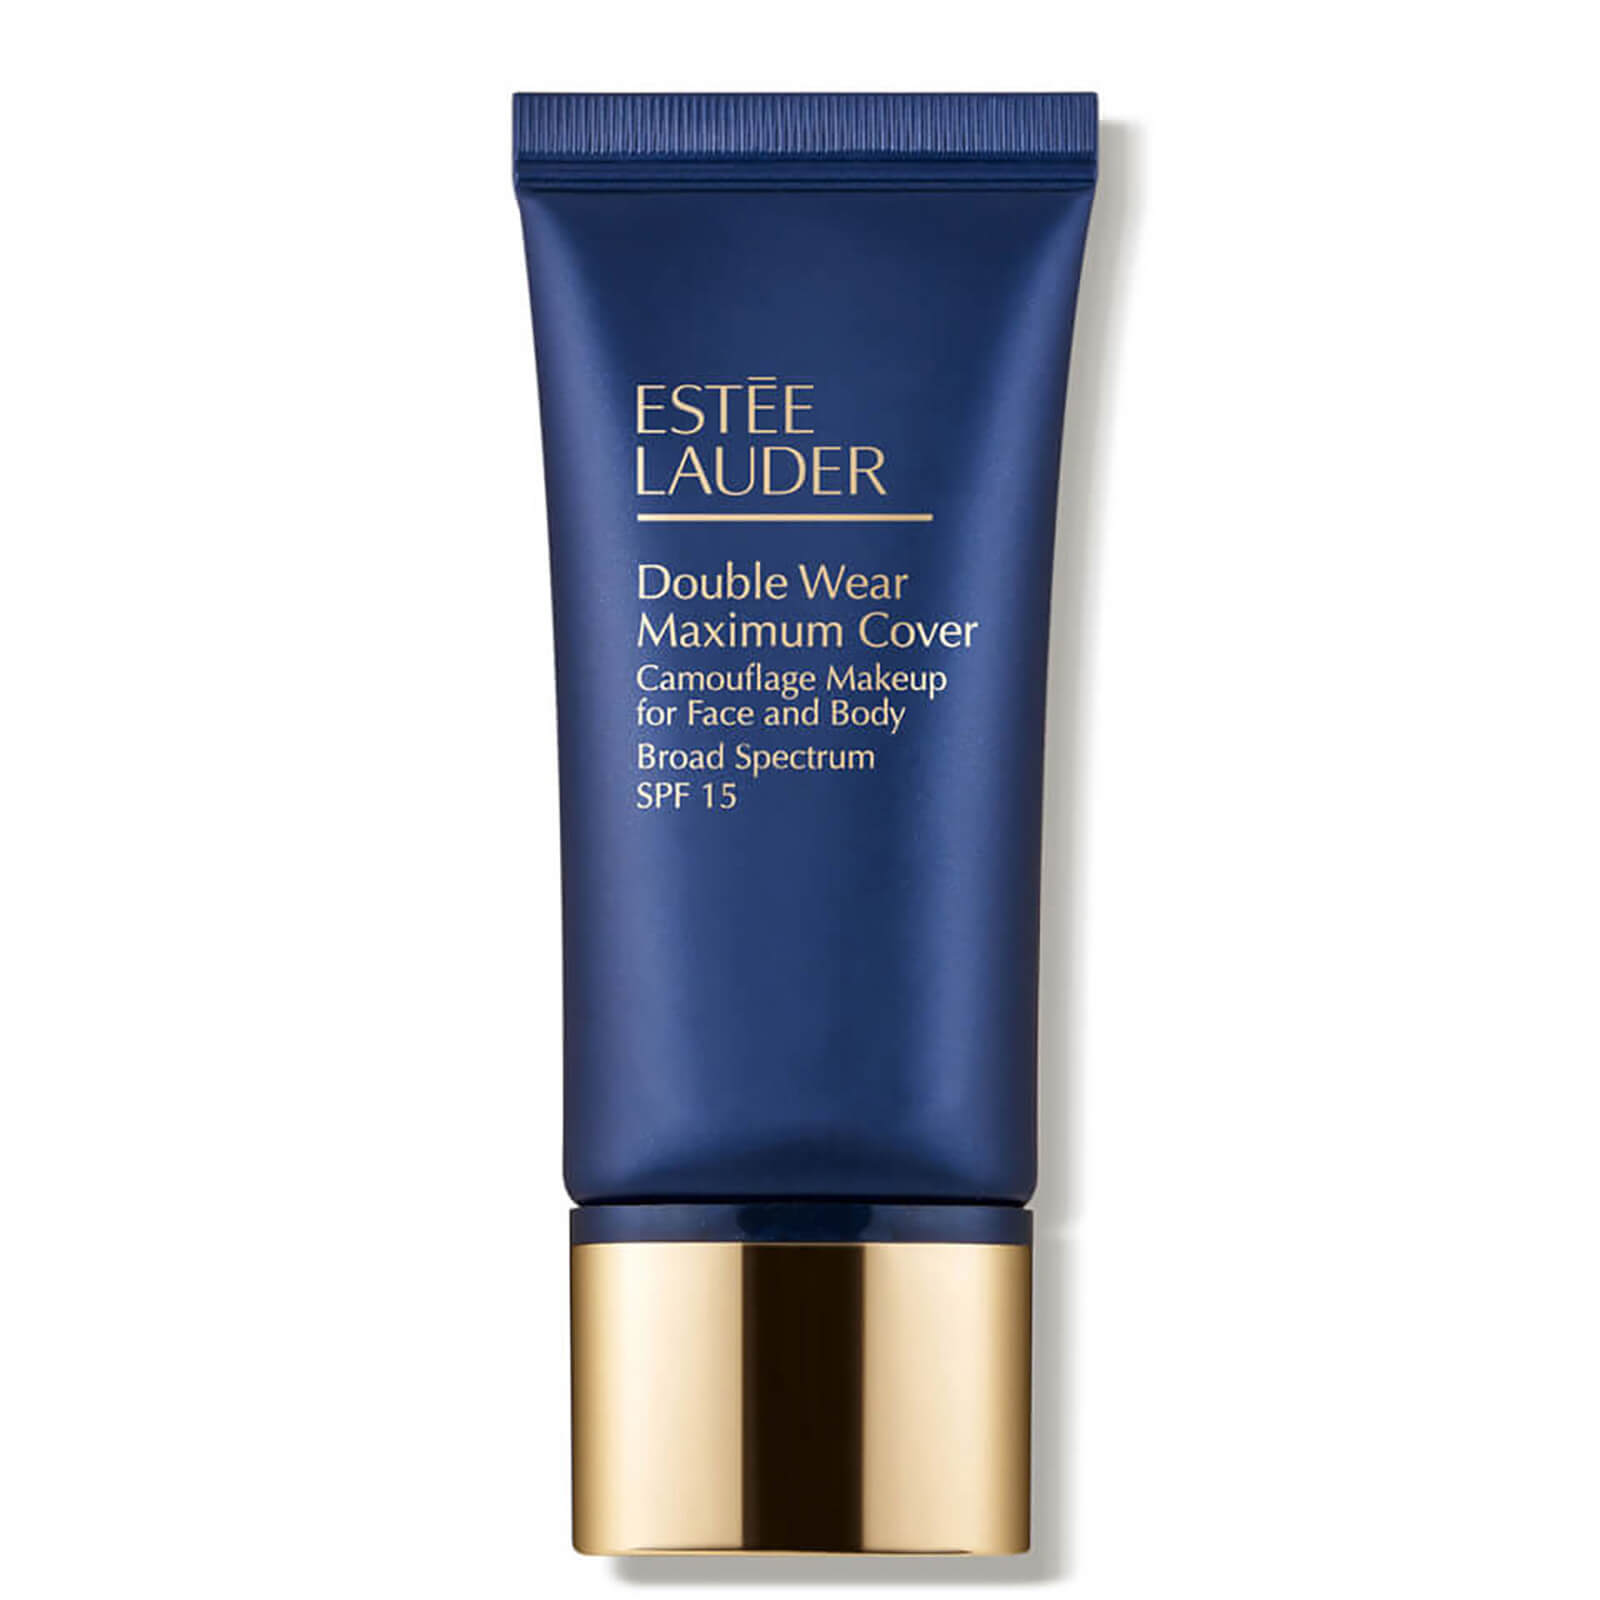 Купить Estée Lauder Double Wear Maximum Cover Camouflage Makeup for Face and Body SPF15 30ml - 2N1 Desert Beige